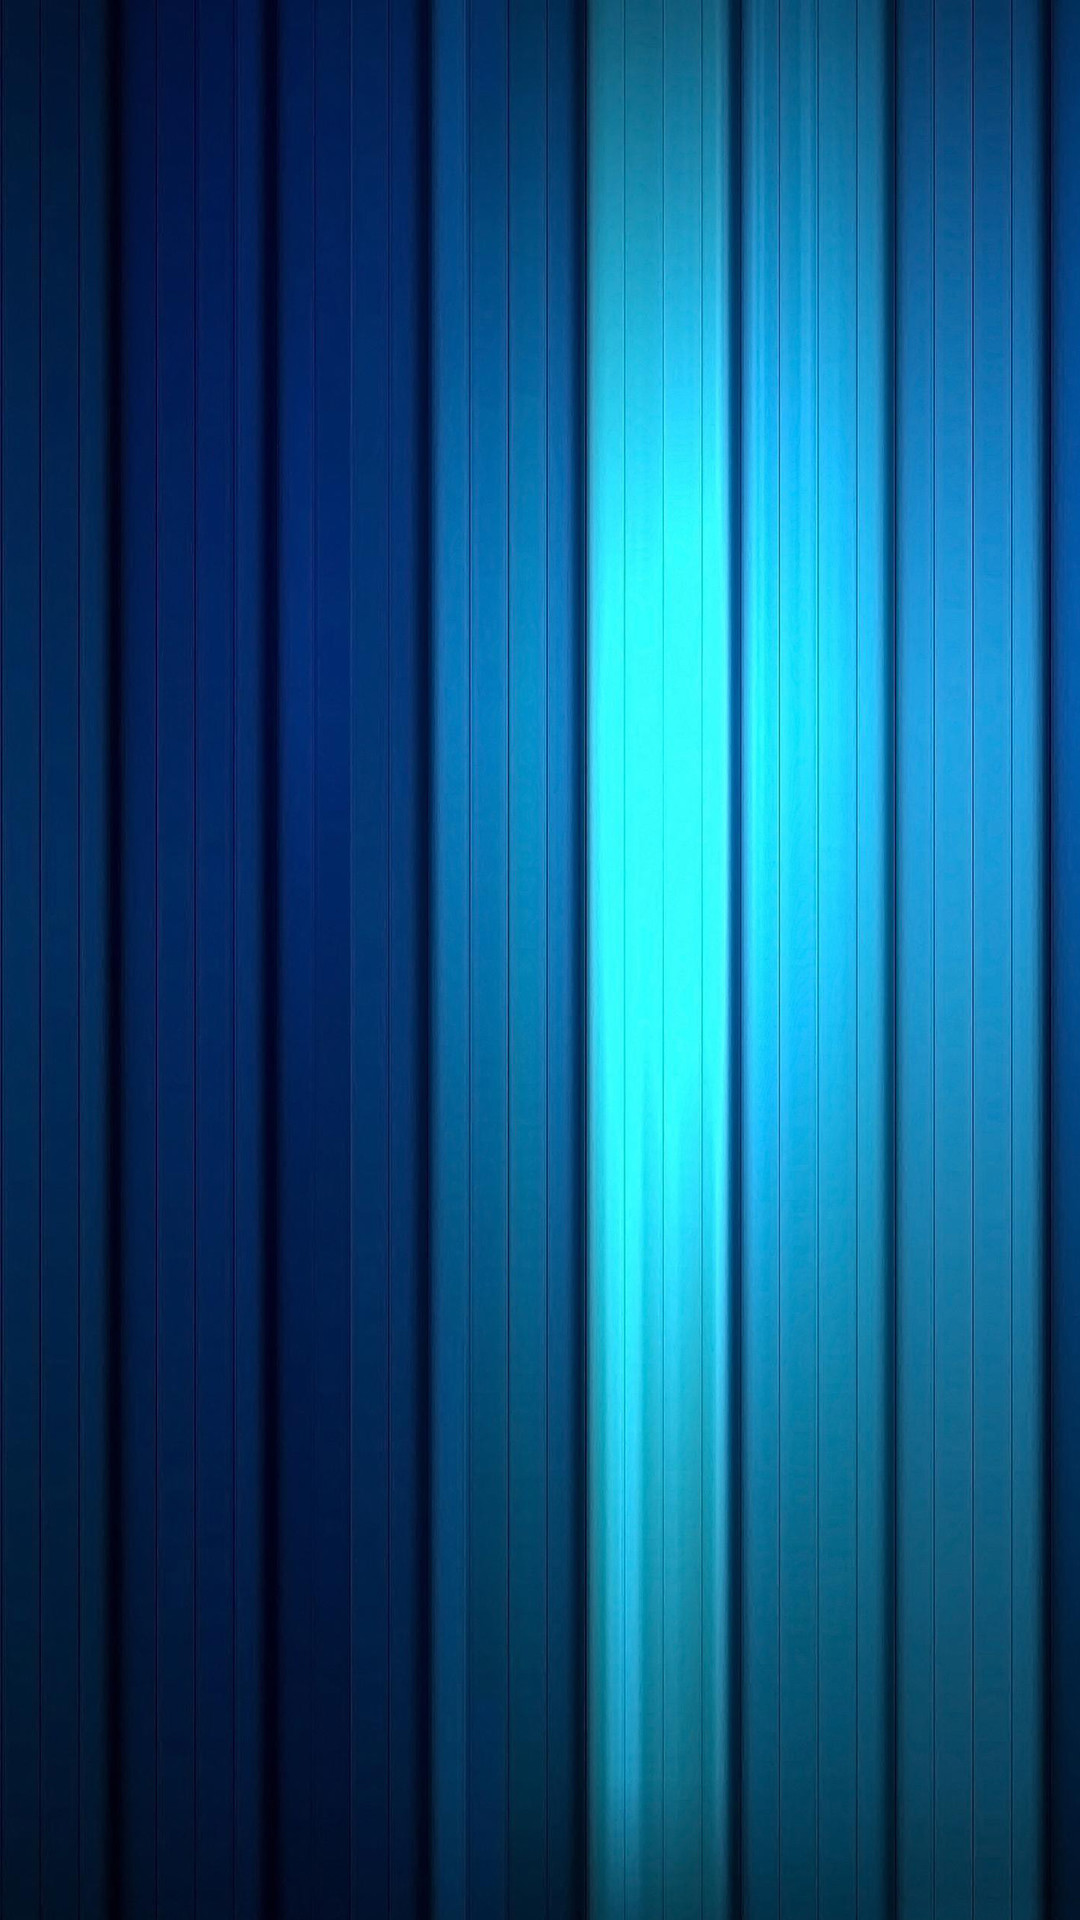 Blue Lines iPhone 6 Wallpaper, iPhone 6 Wallpaper, iPhone 6 Plus, HD .